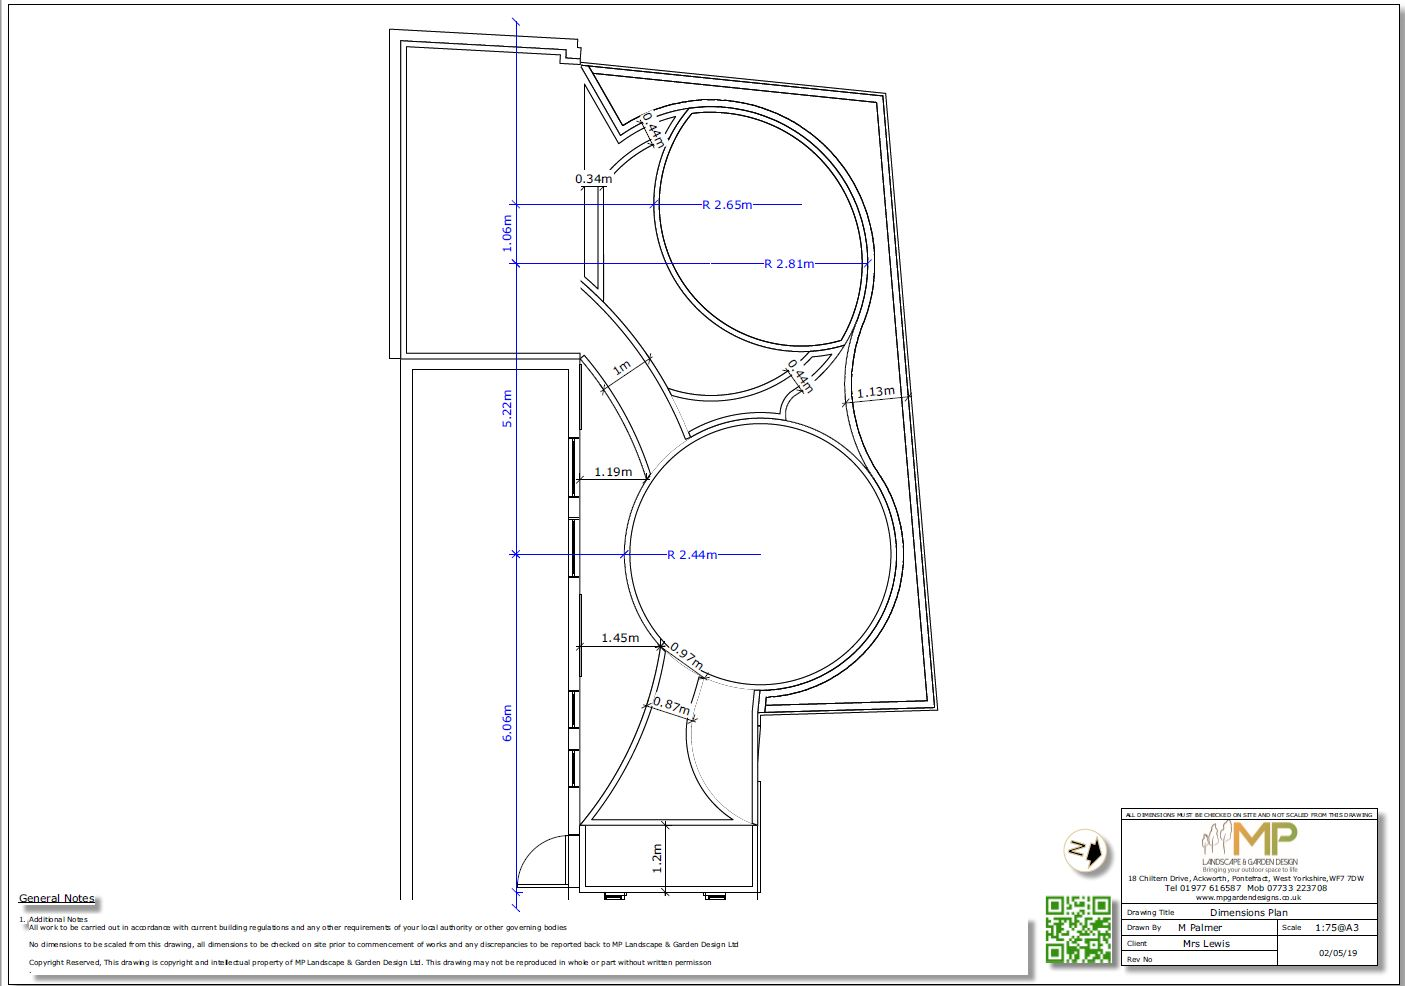 4, Garden layout plans-Dimension, Castleford.